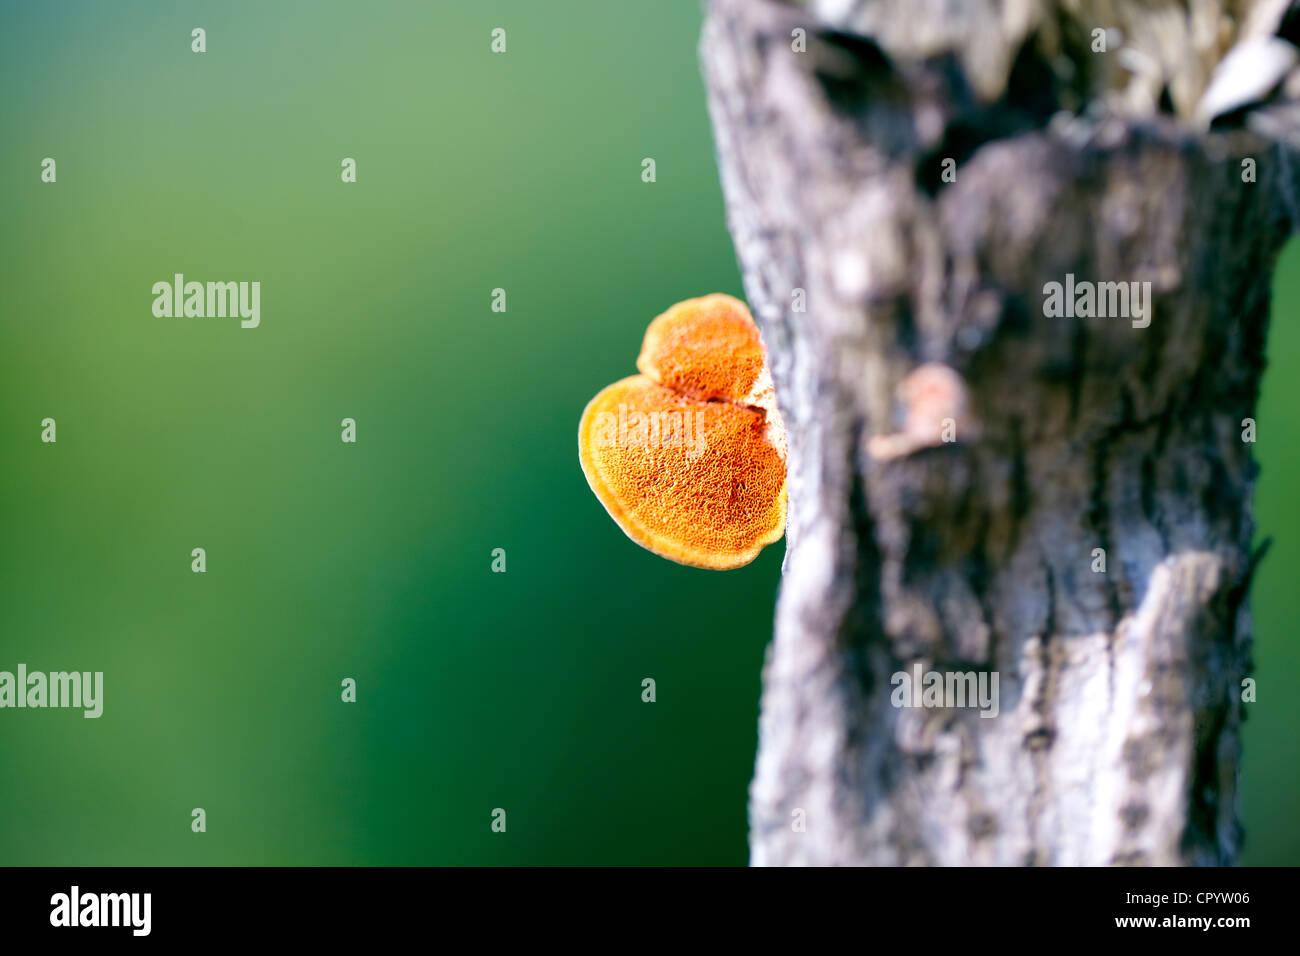 Fungus on tree, Makro, Big Island, Hawaii, USA - Stock Image